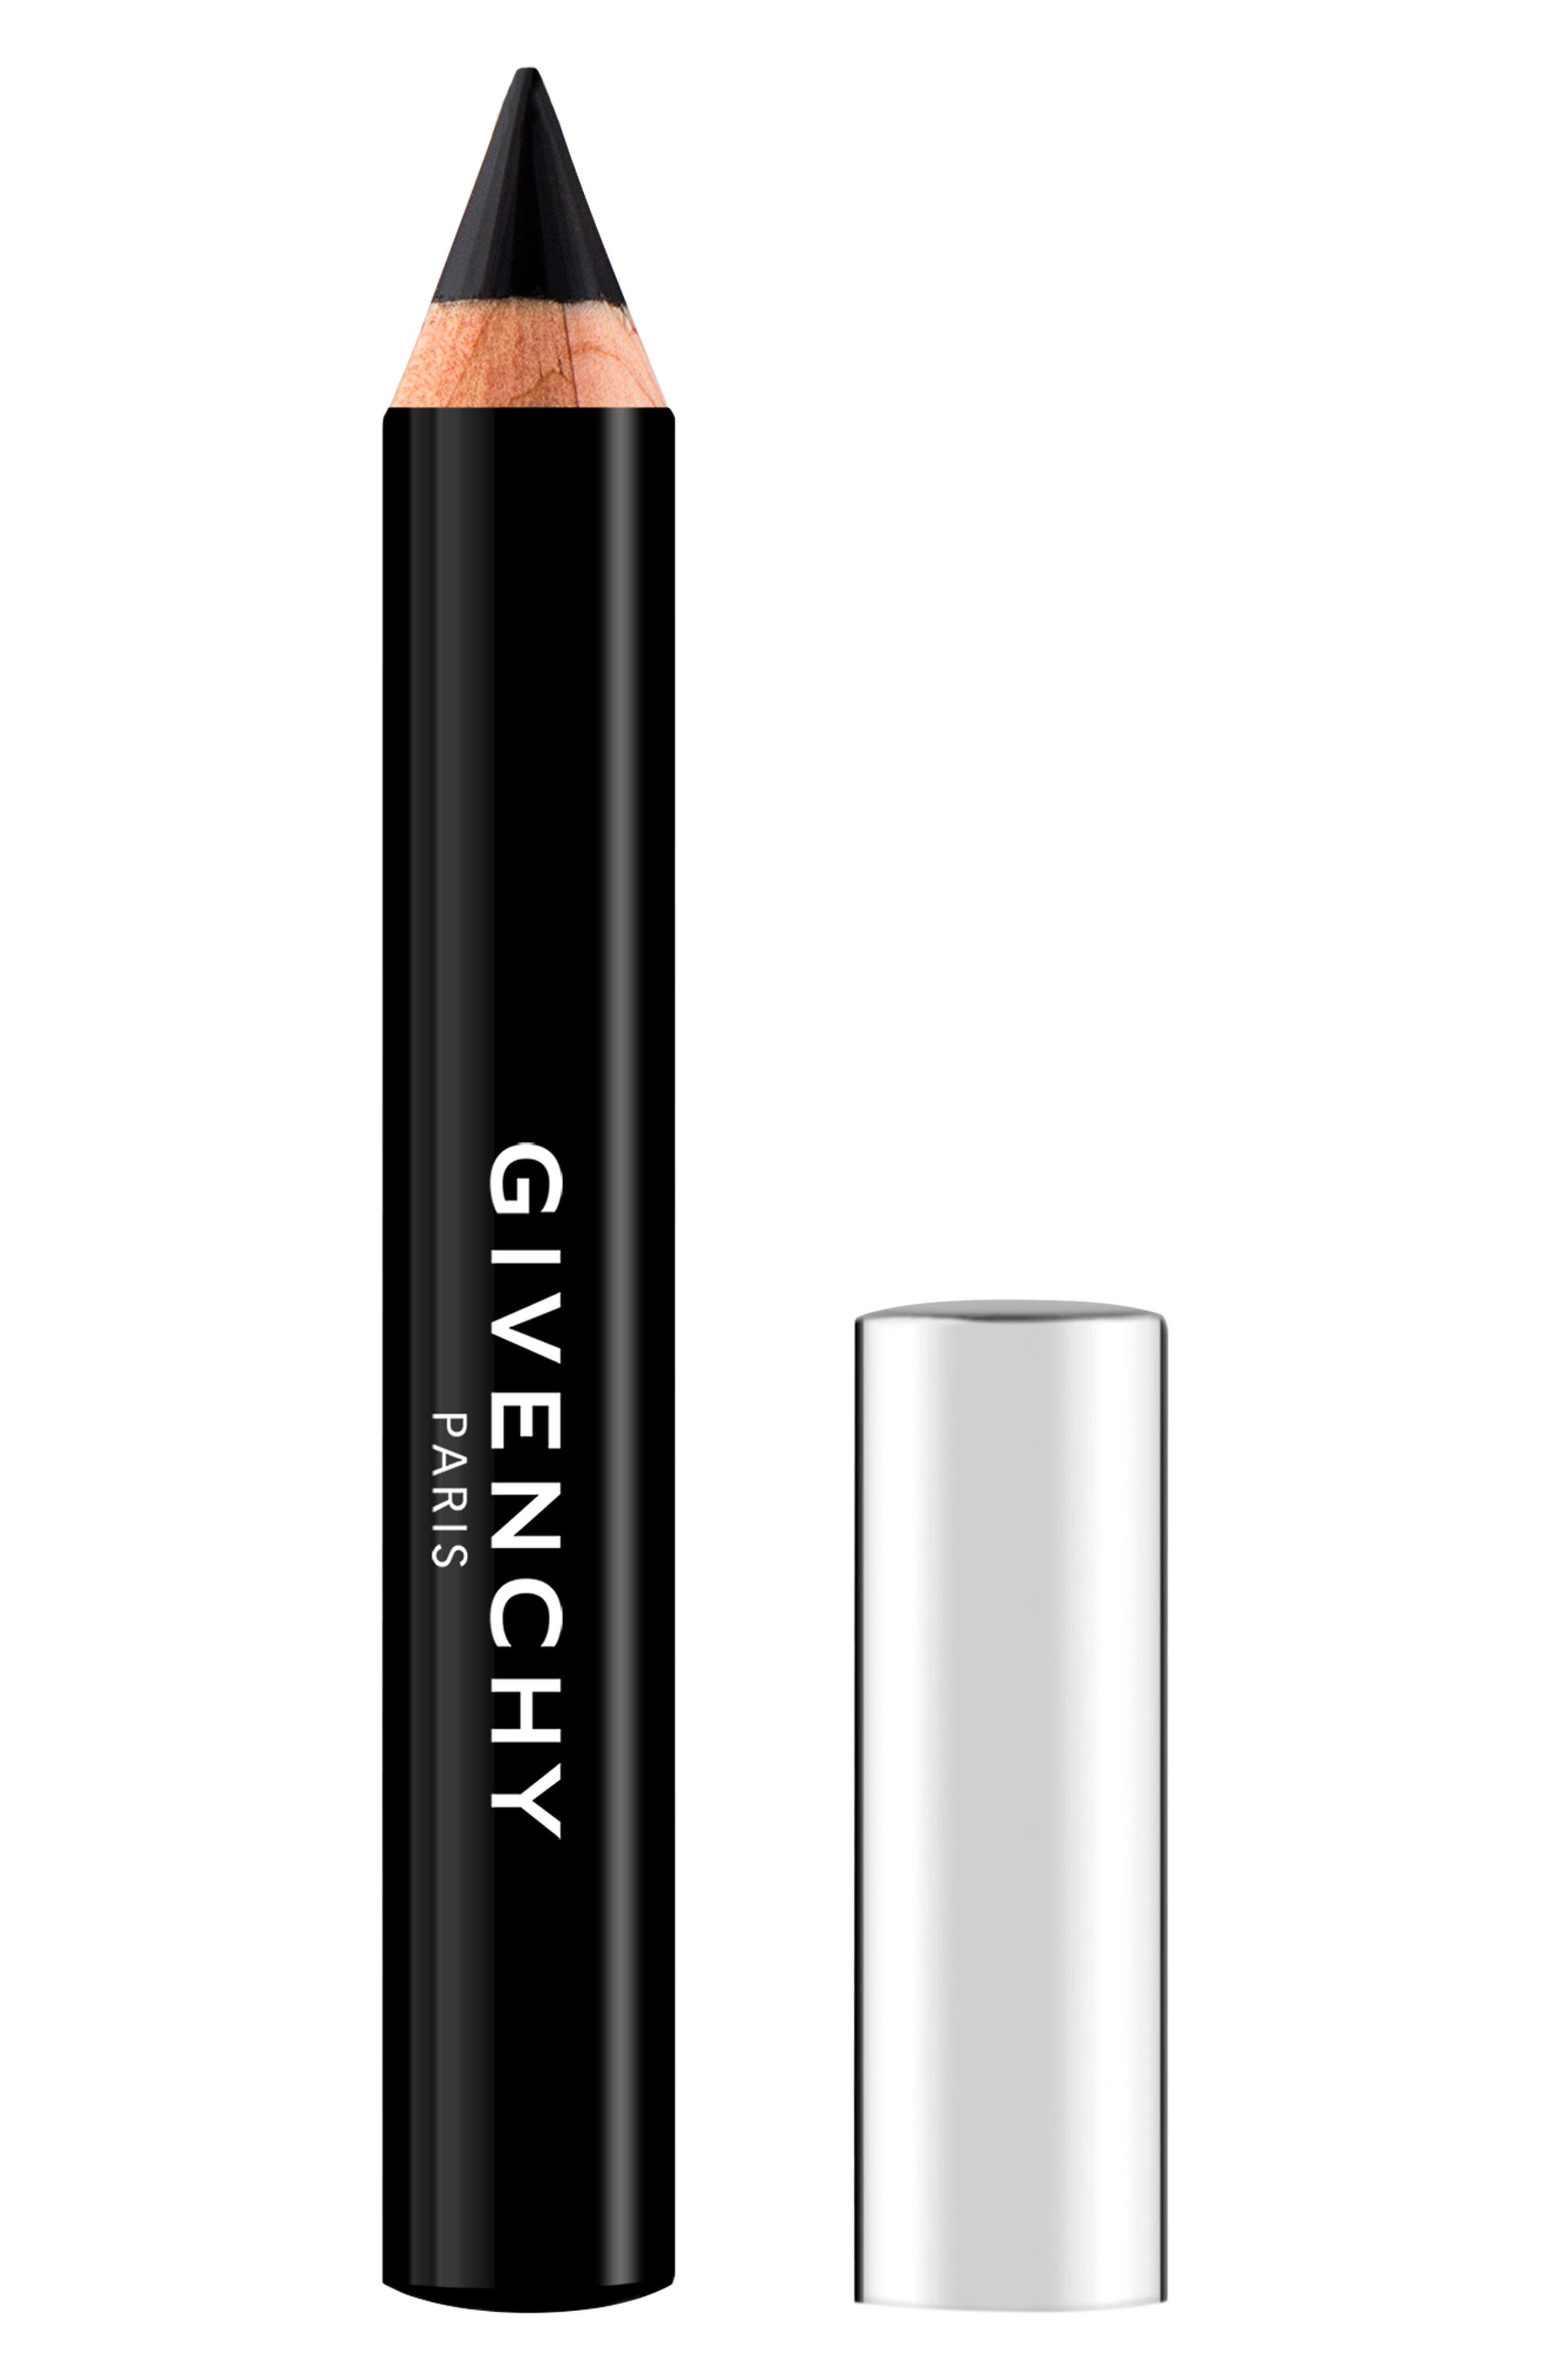 givenchy makeup price